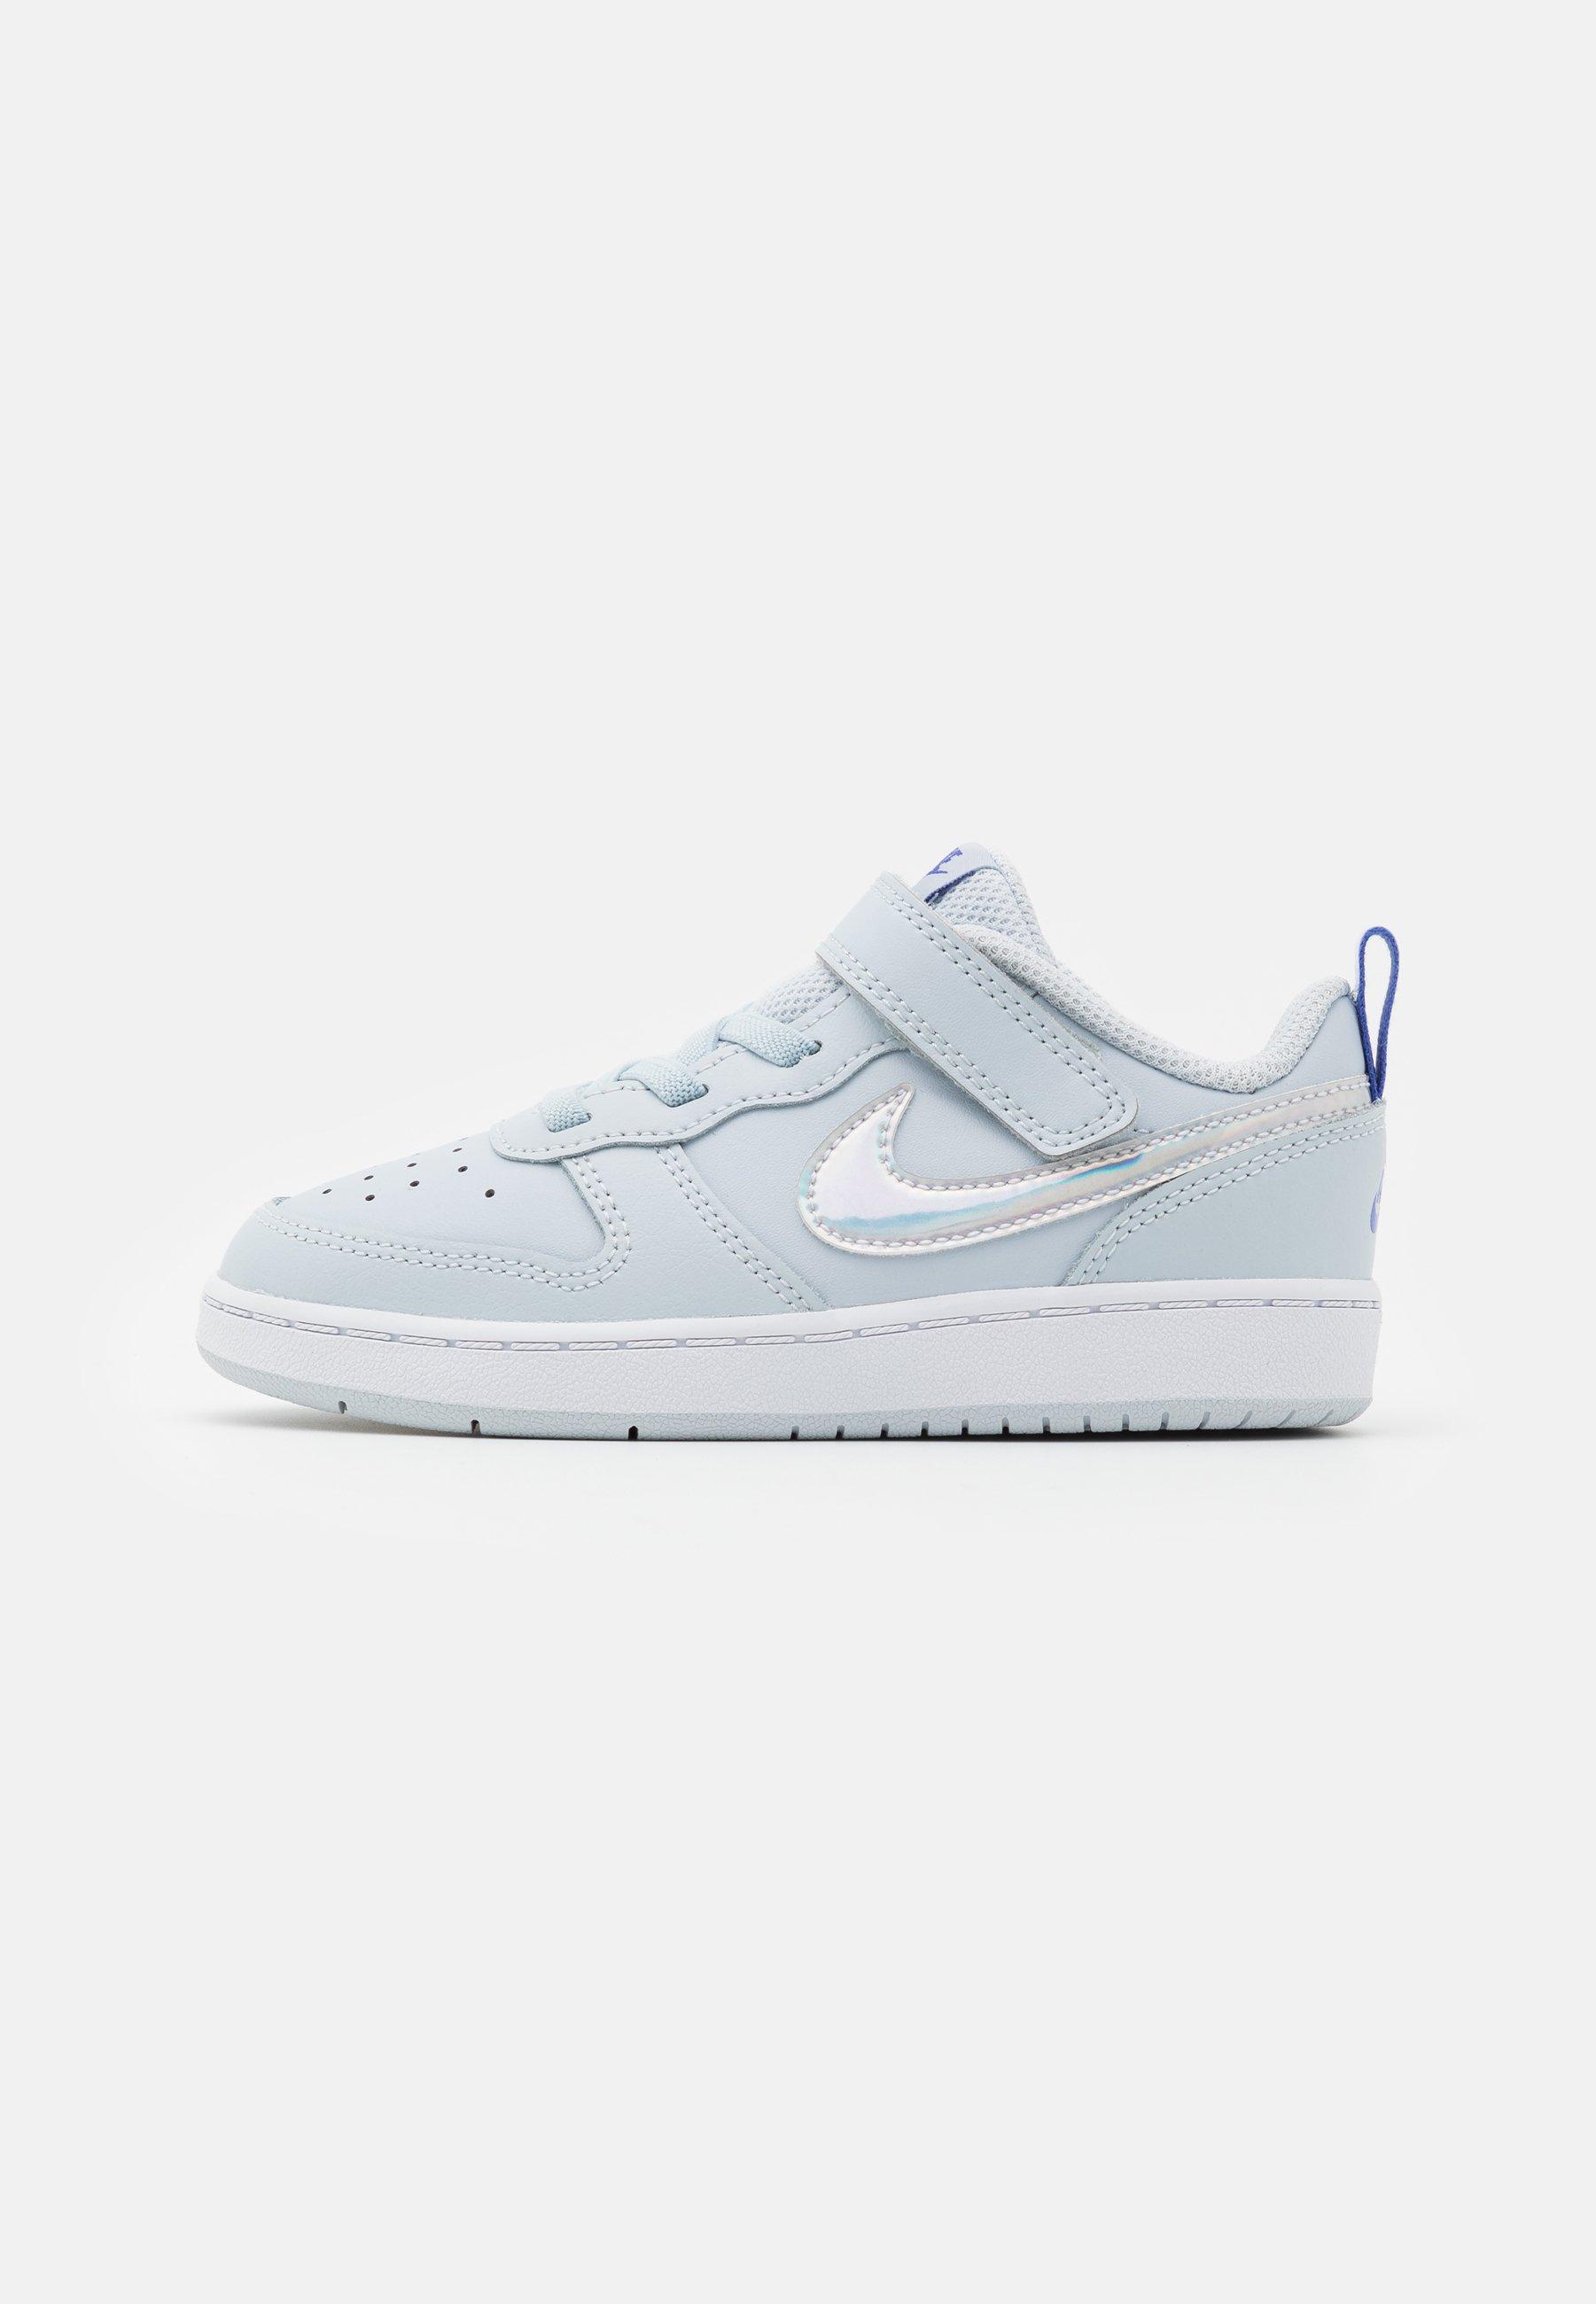 Nike Sportswear en ligne | Nouvelle collection sur Zalando